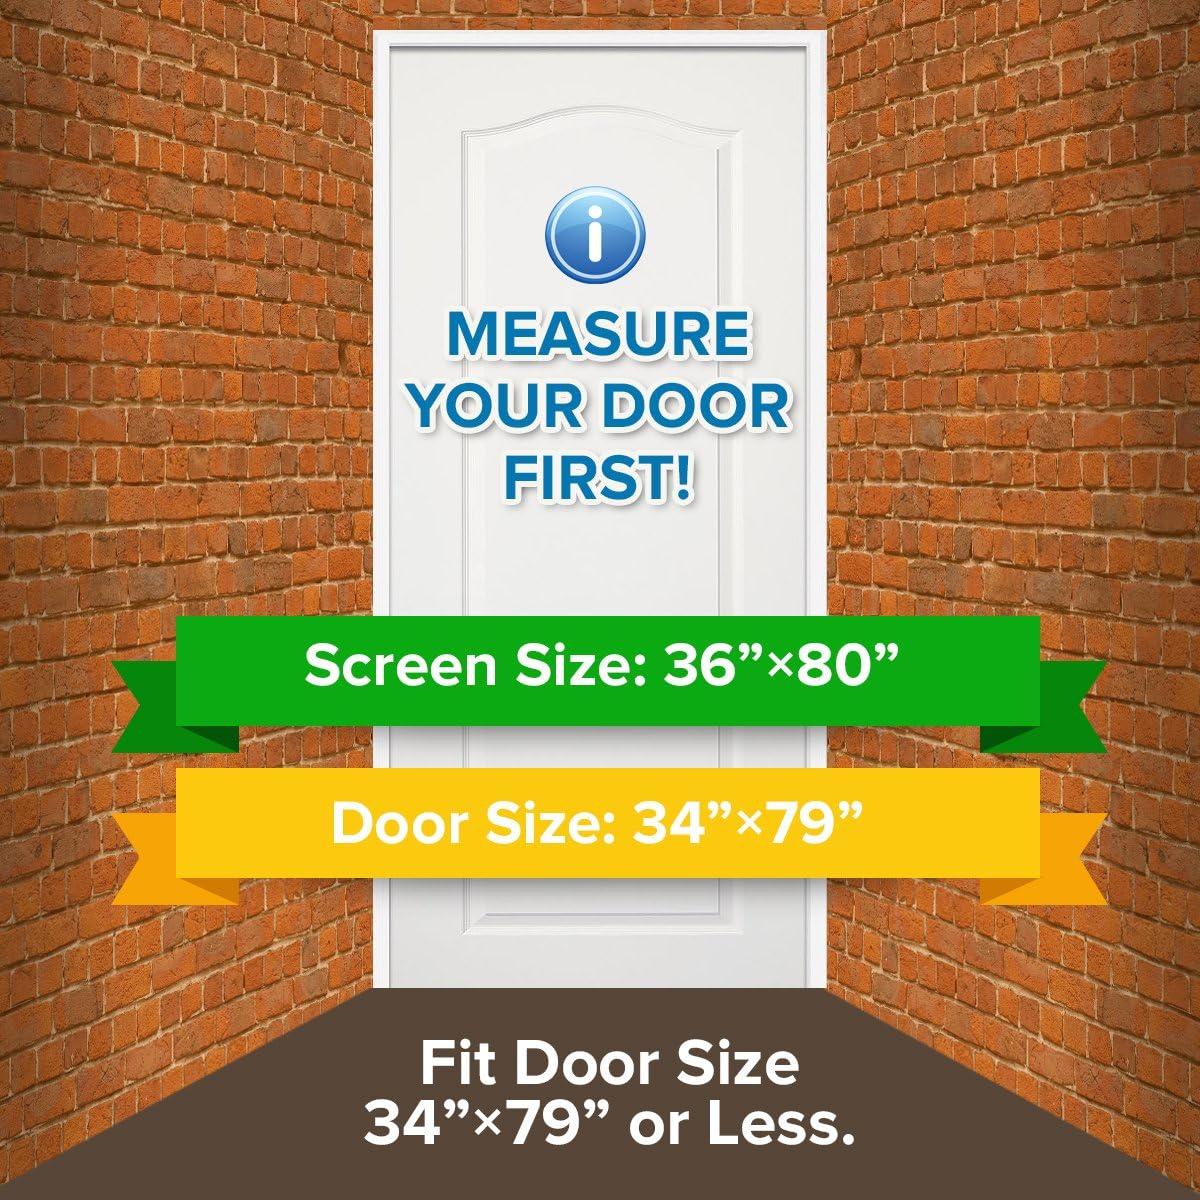 Fits Door Opening Up to 34x95 Full Frame Loop Sewn,Quick Close No Slightest Gap Dooreasy Hands-Free Magnetic Screen Door Polyester Mesh